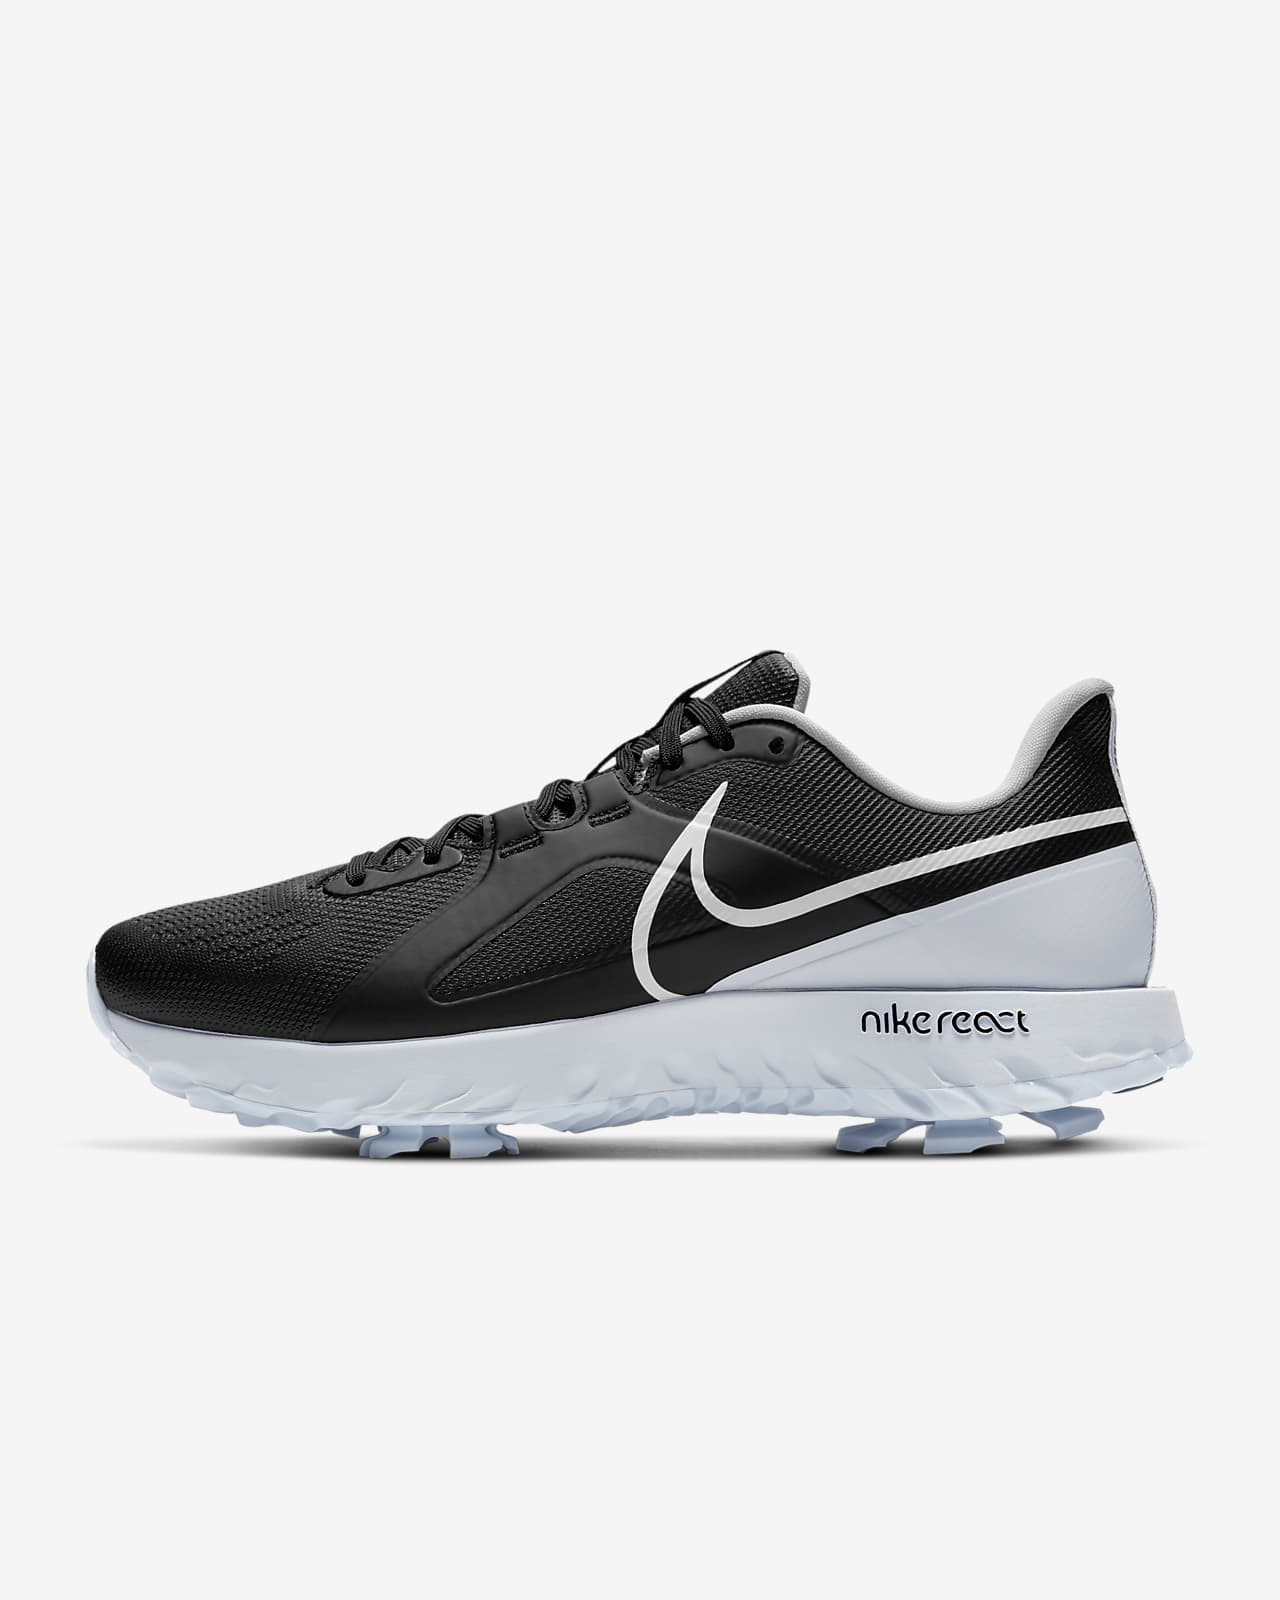 Chaussure de golf Nike React Infinity Pro